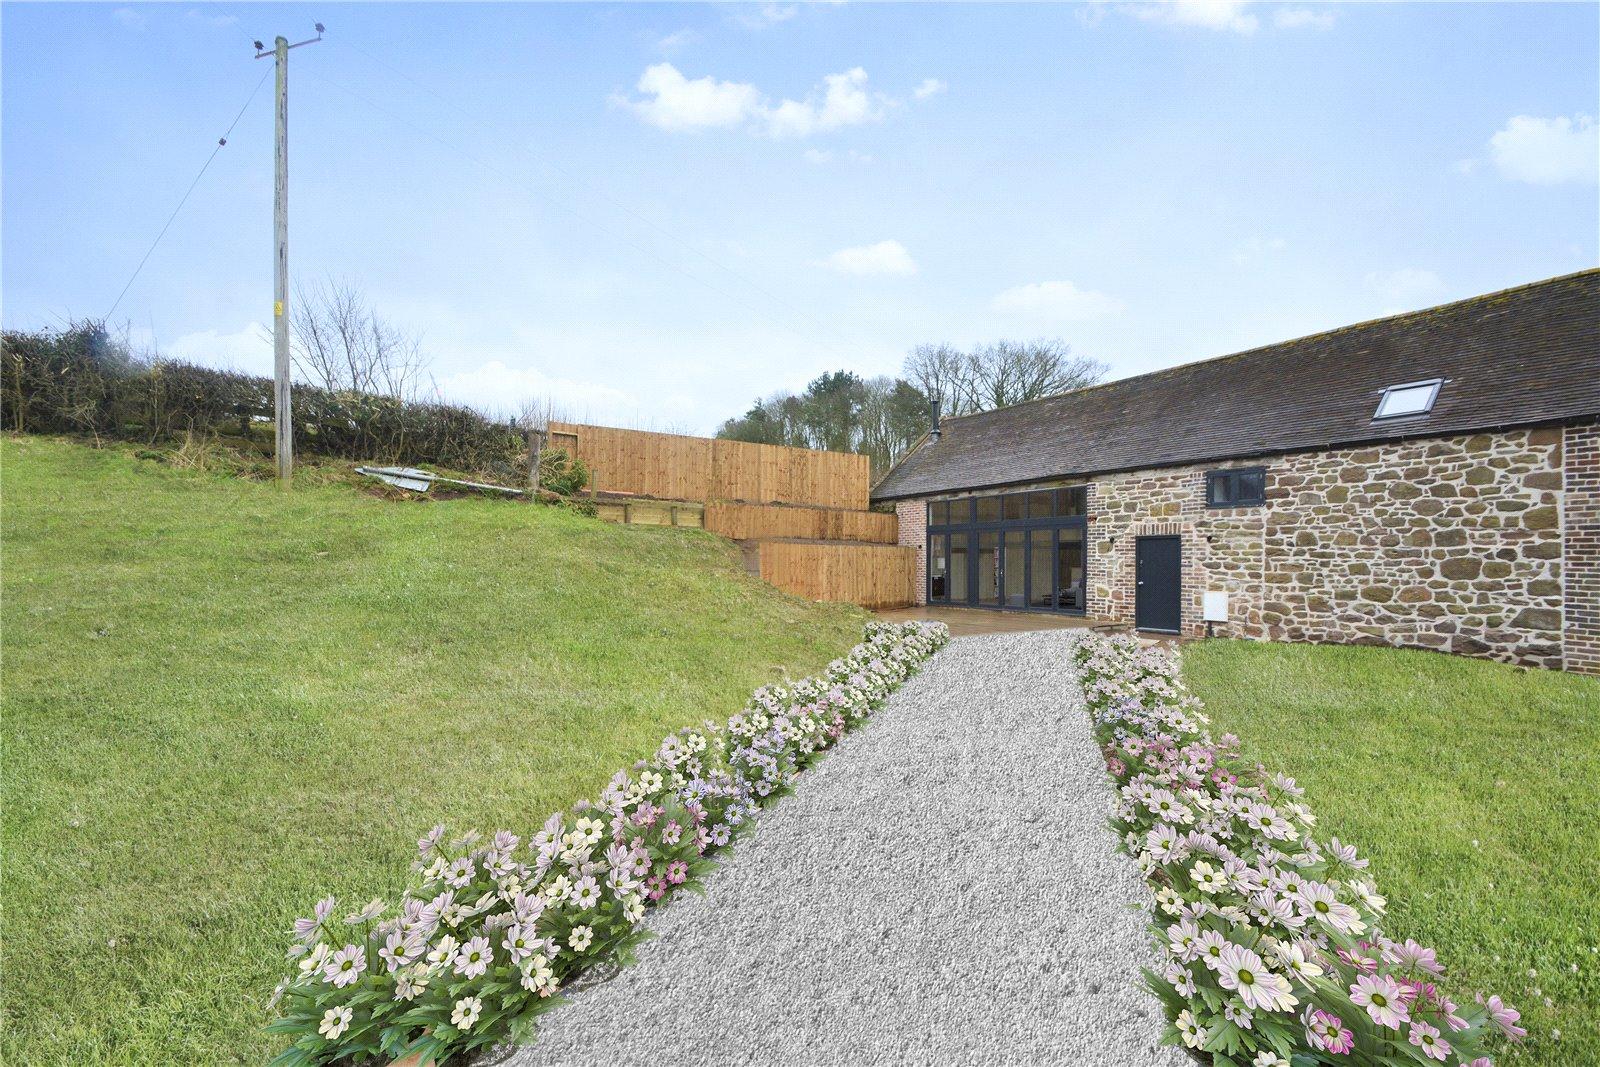 Mapletime, Sutton Wood Farm, Shifnal, Shropshire, TF11